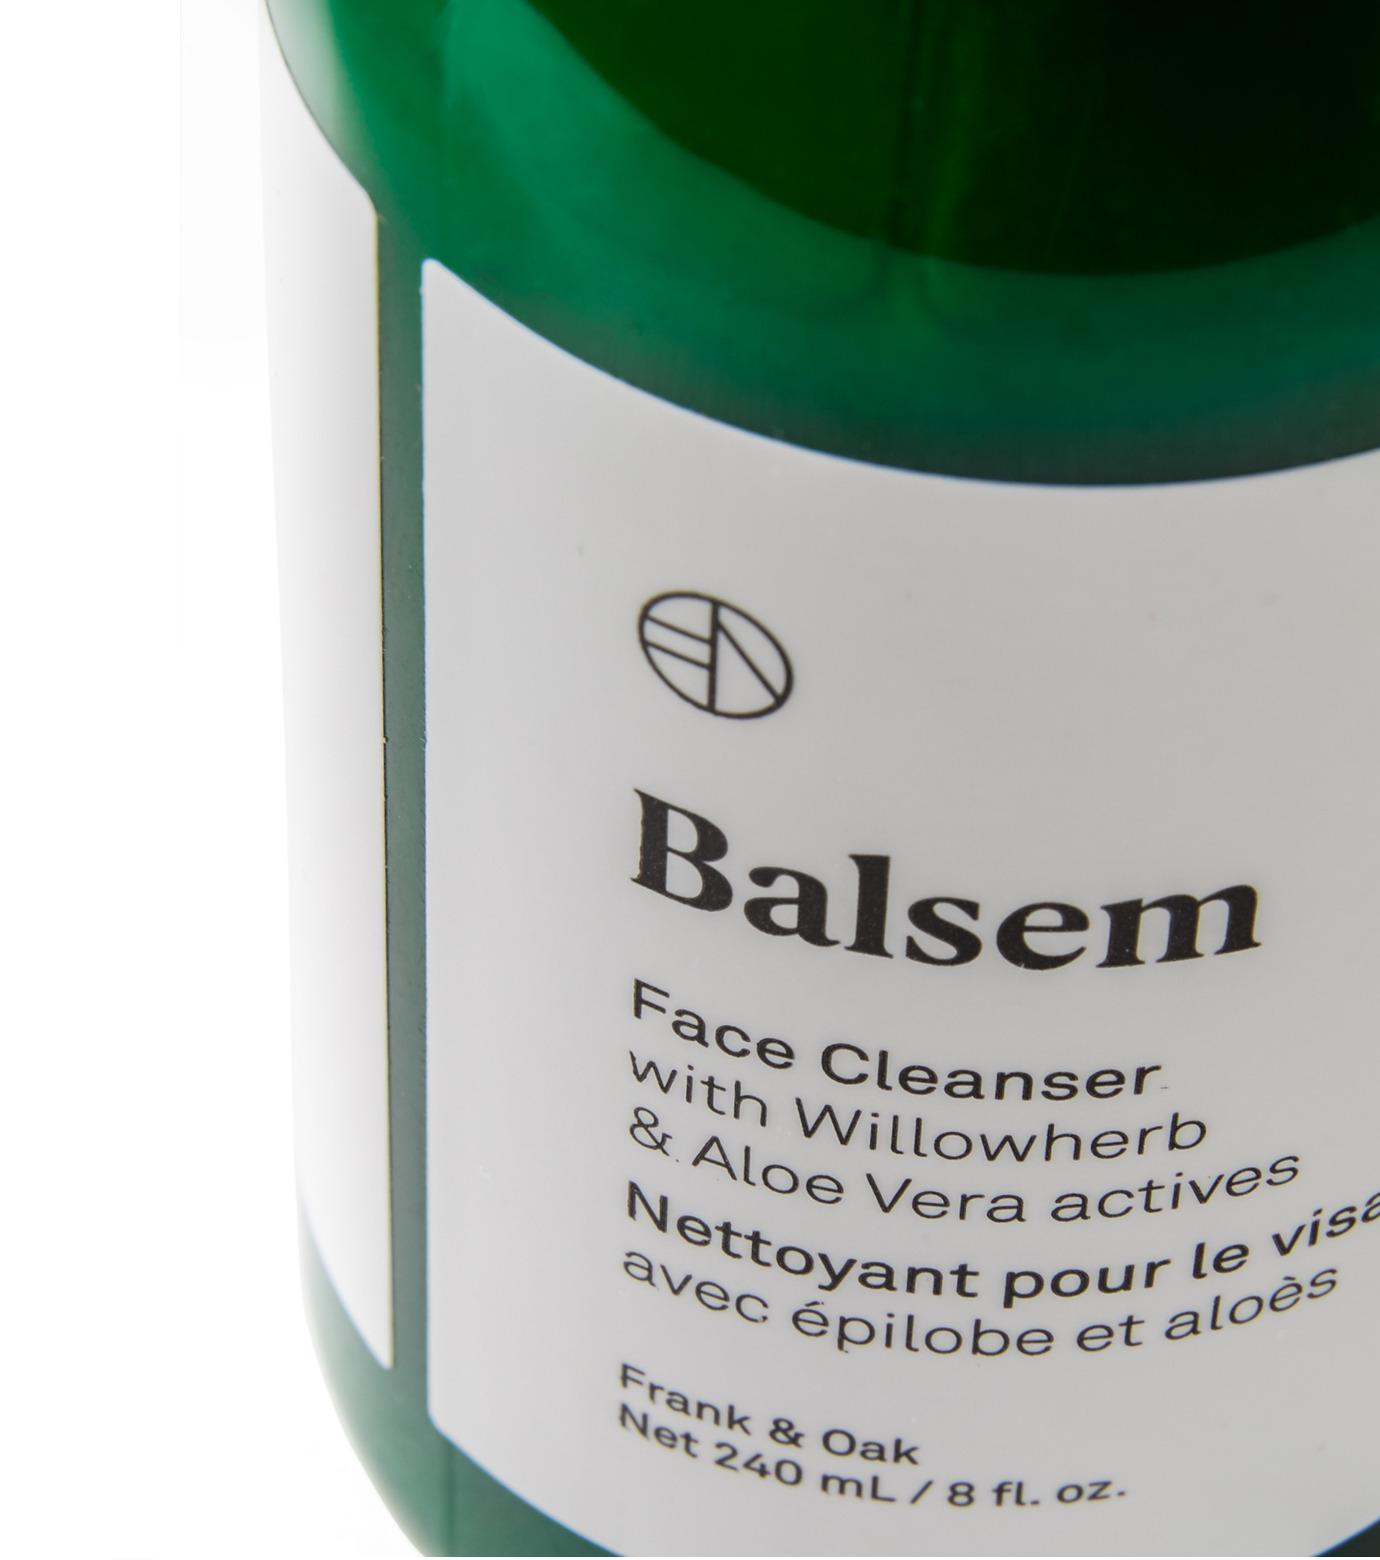 BALSEM()のFACE CLEANSER 240g-WHITE(BATH-BODY-GROOMING/BATH-BODY-GROOMING)-MS-31017B-4 拡大詳細画像2